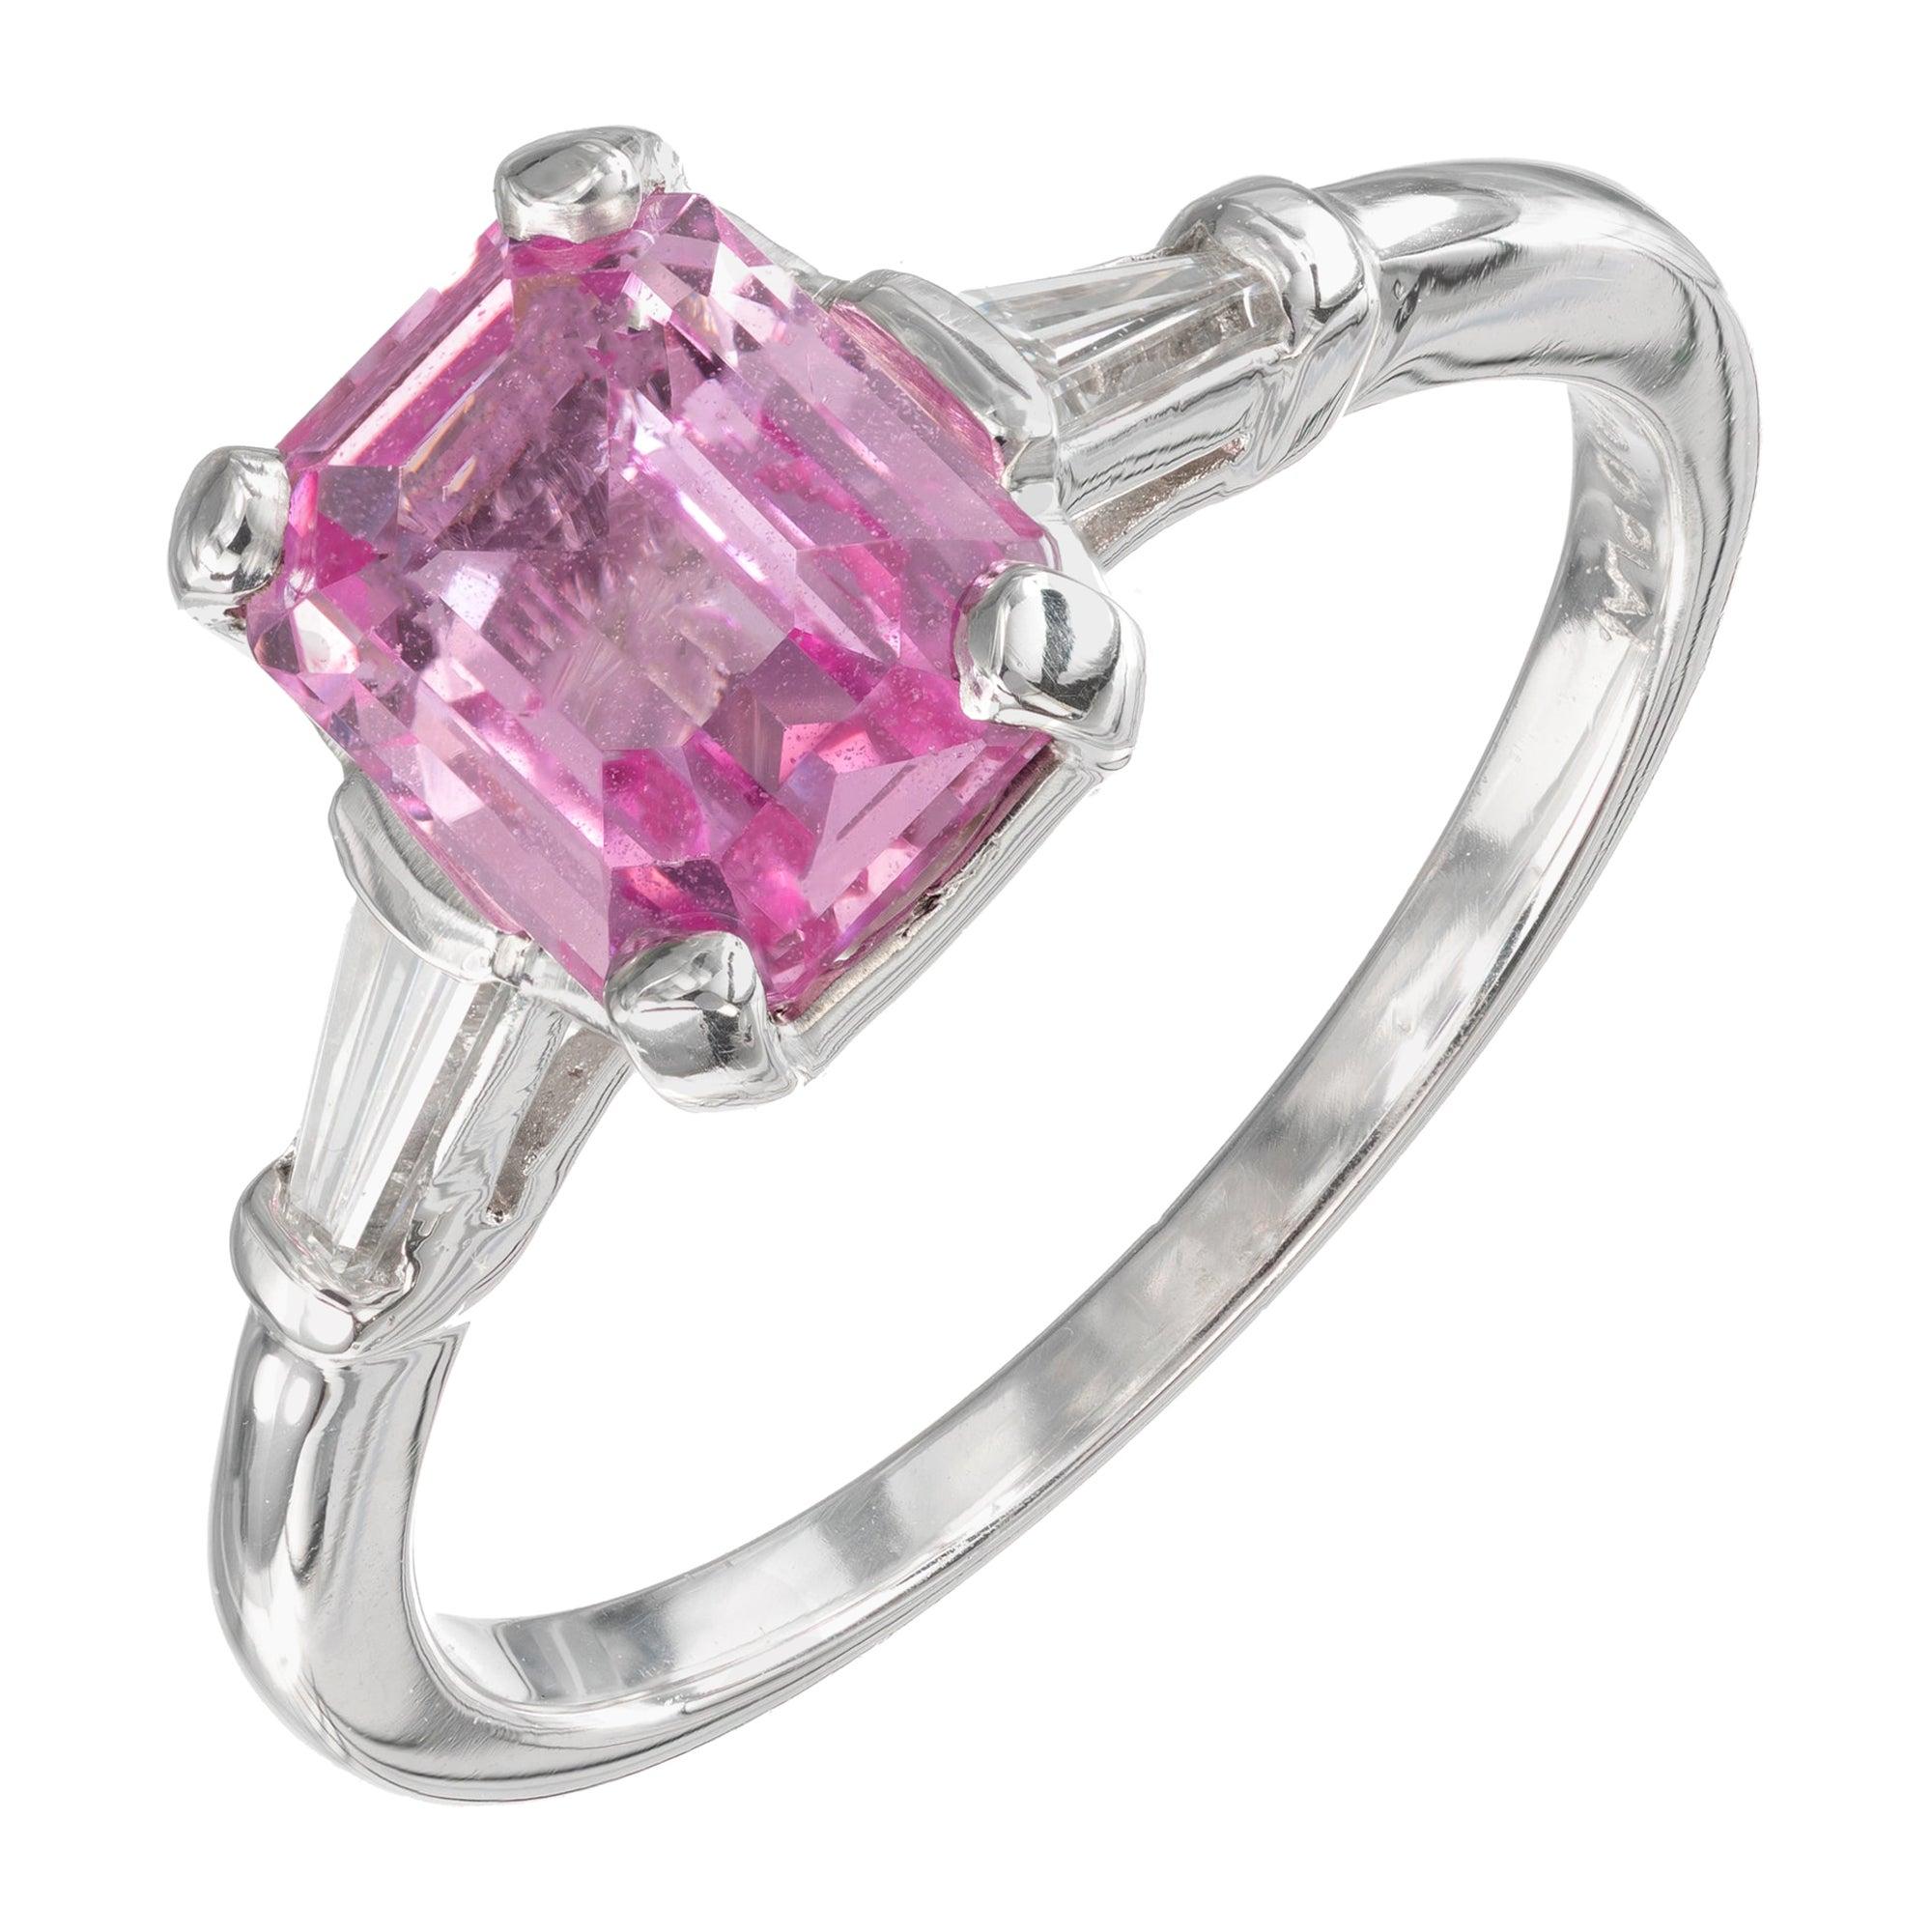 GIA Certified 1.82 Carat Pink Sapphire Diamond Platinum Engagement Ring